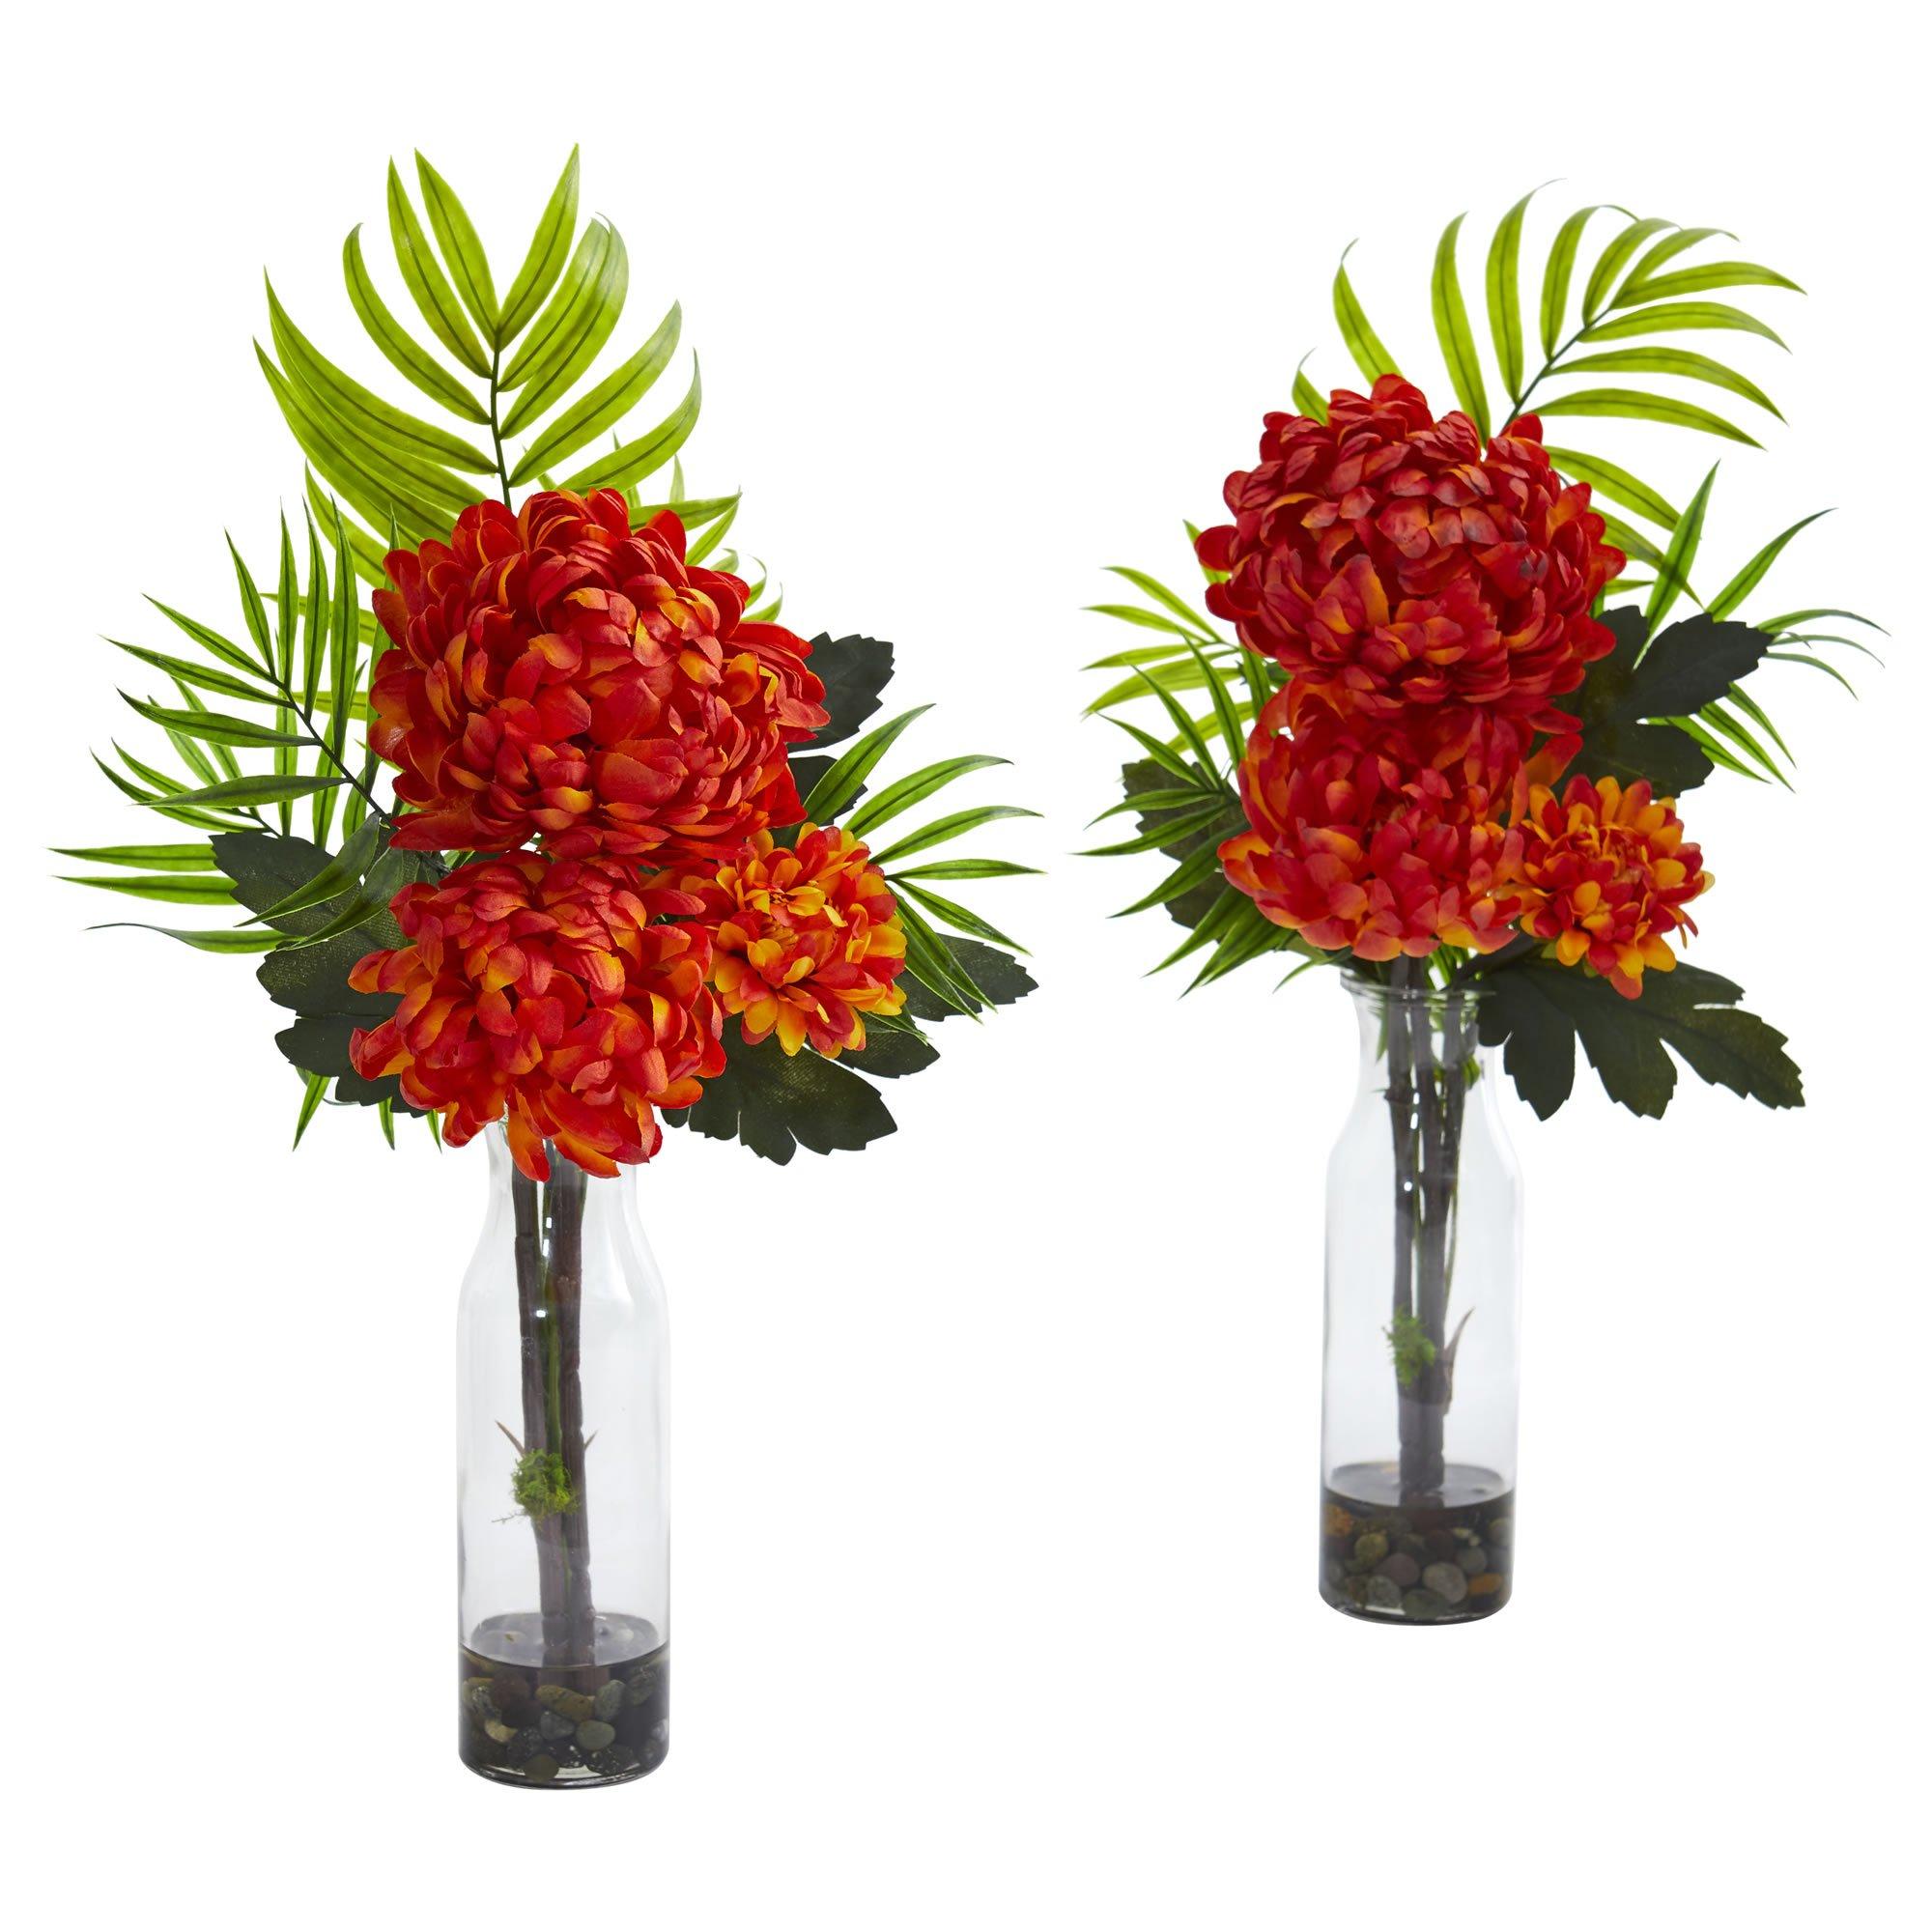 Artificial Flowers Tropical Mum Orange Arrangement Set Of 2